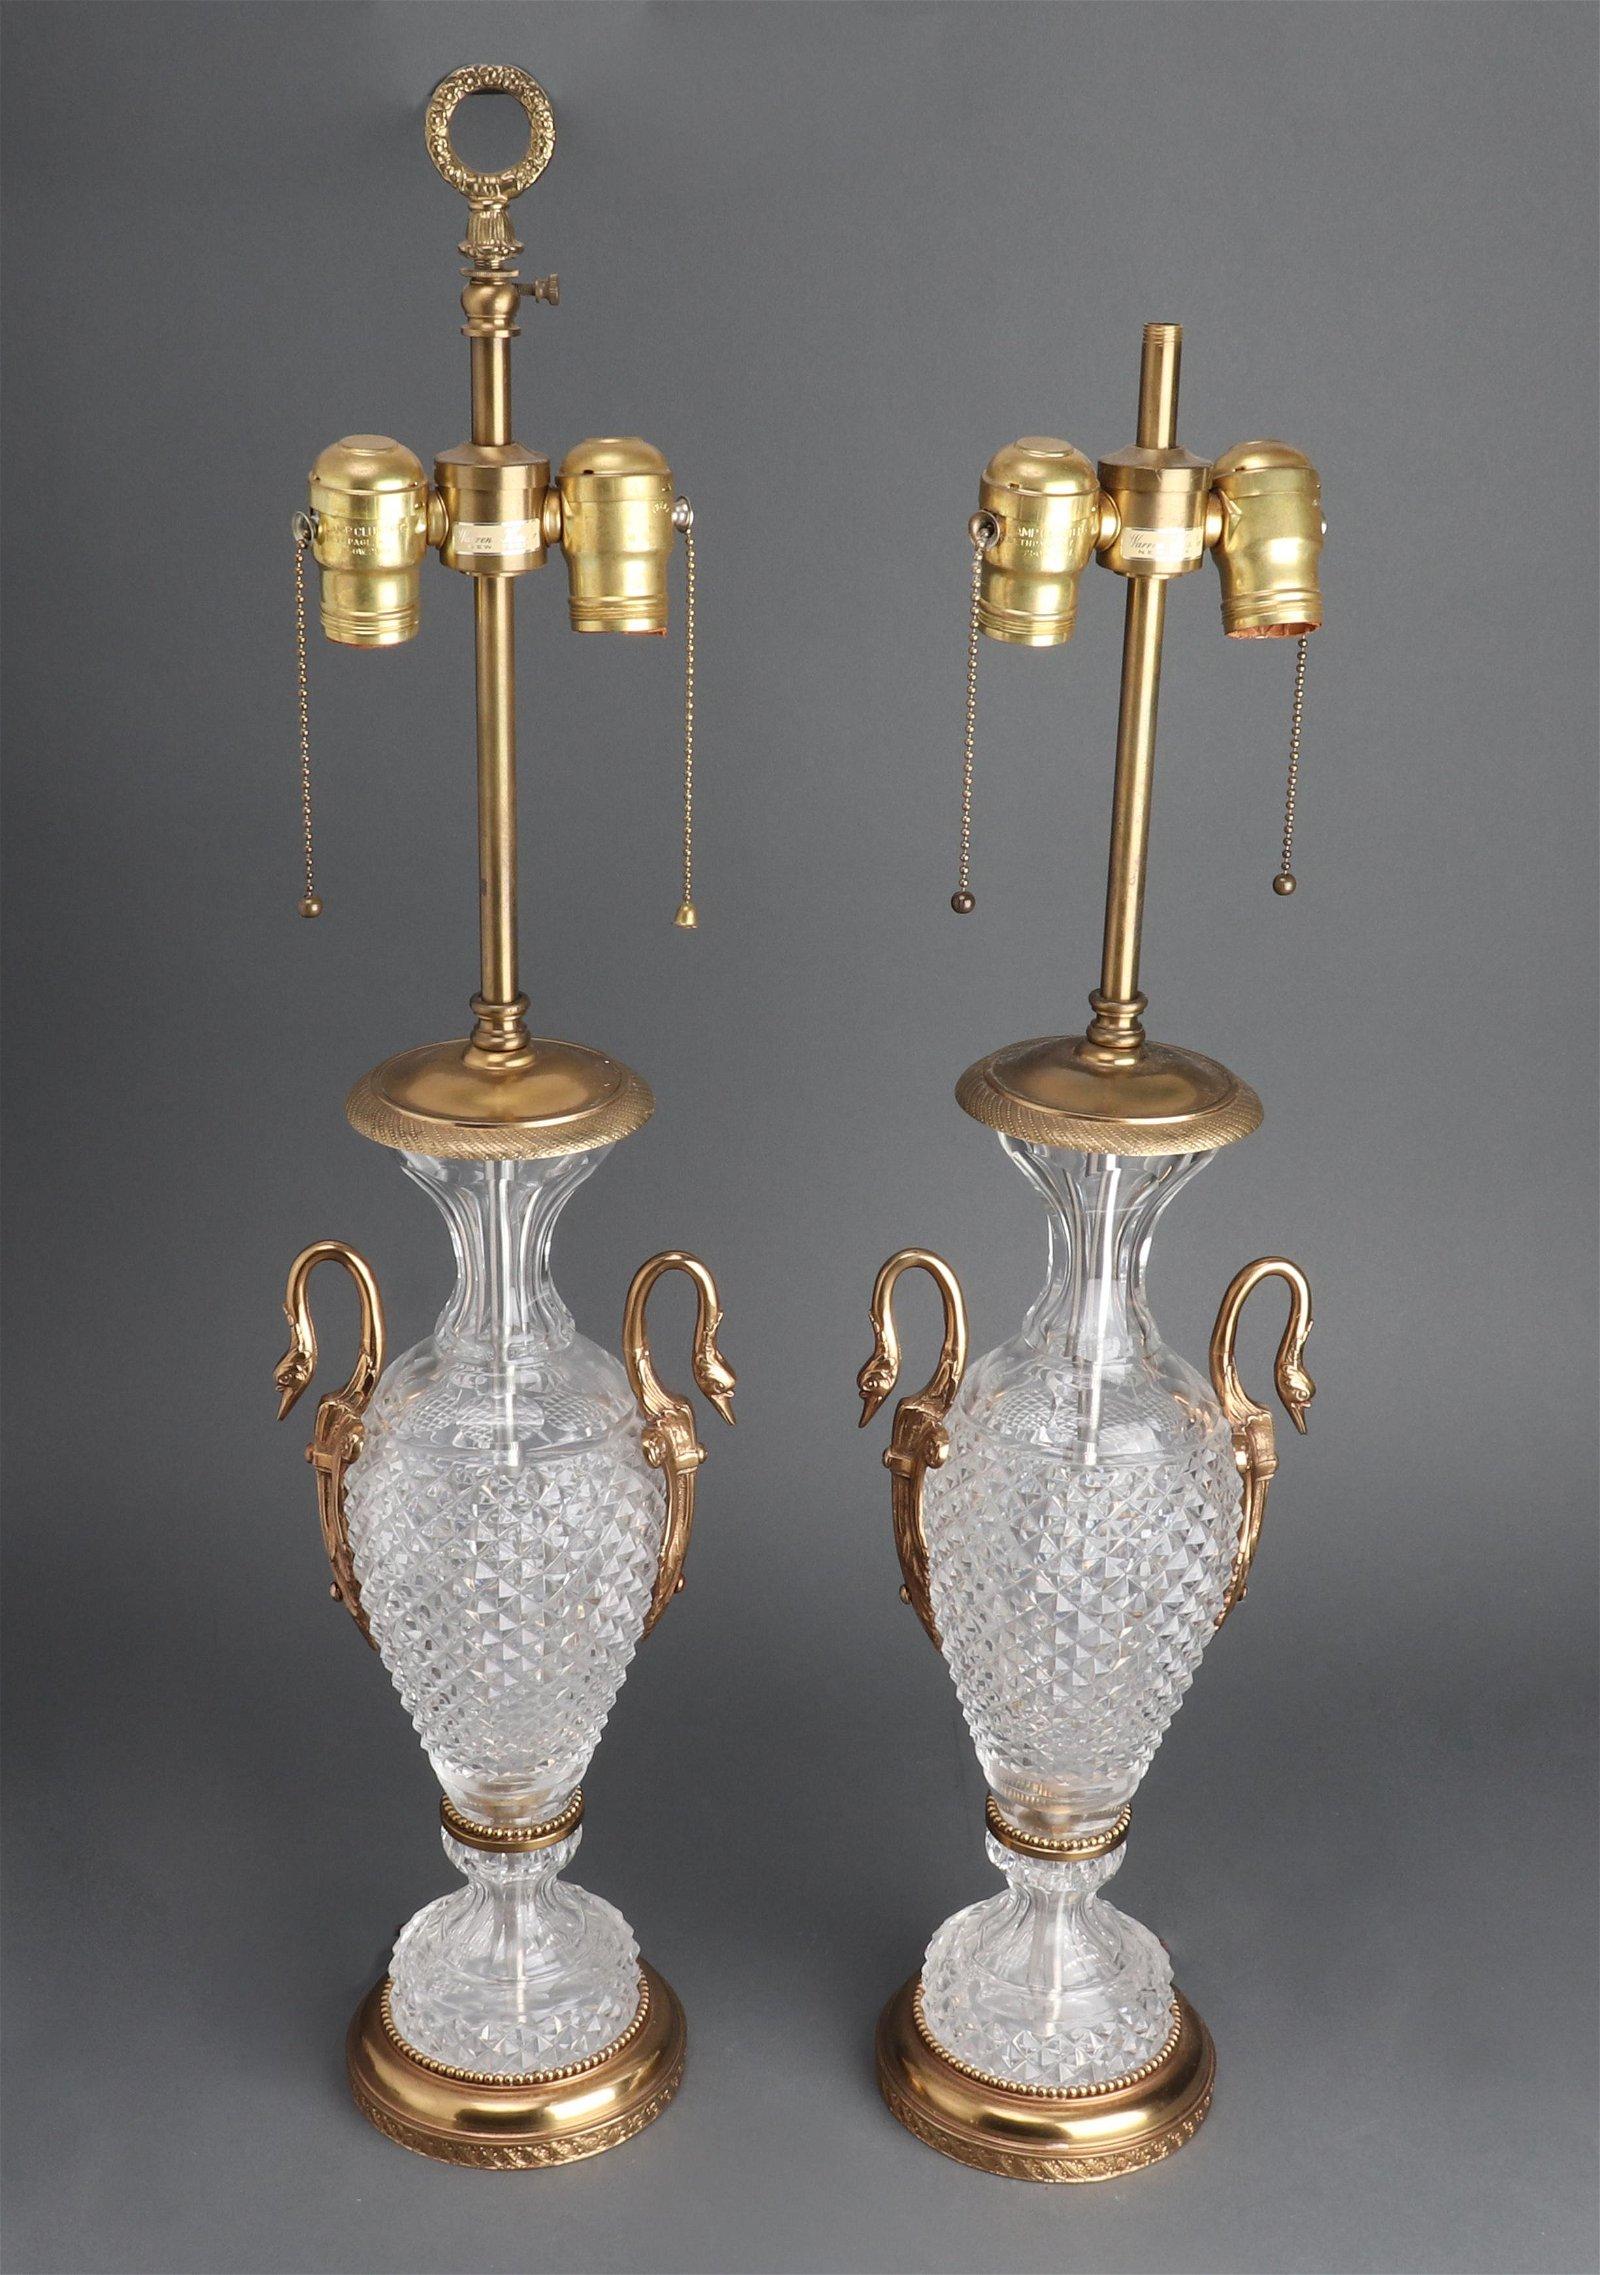 Warren Kessler Baccarat Style Table Lamps, Pair